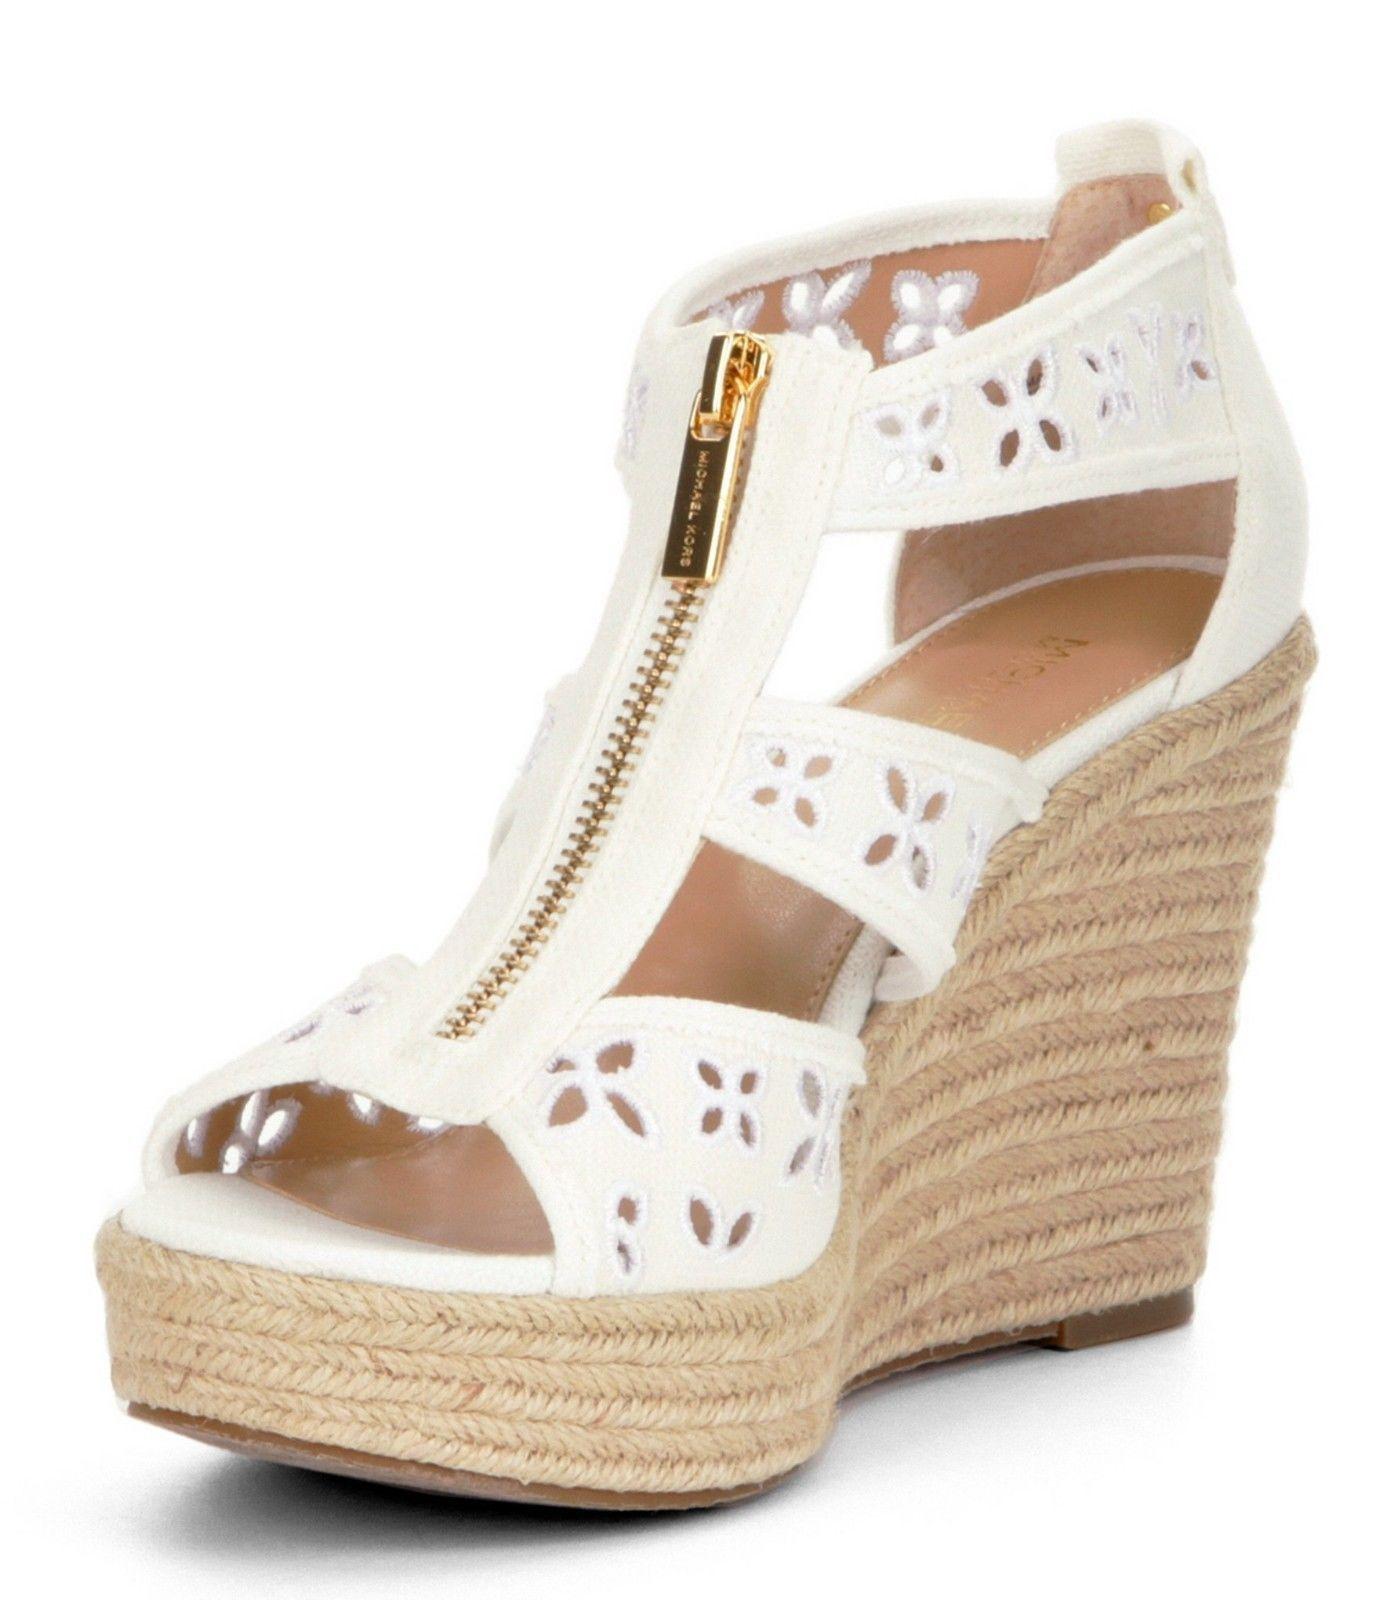 109ec4eaca Michael Kors Damita Floral Platform Wedge Sandal/Canvas/Optic White/Various  Size